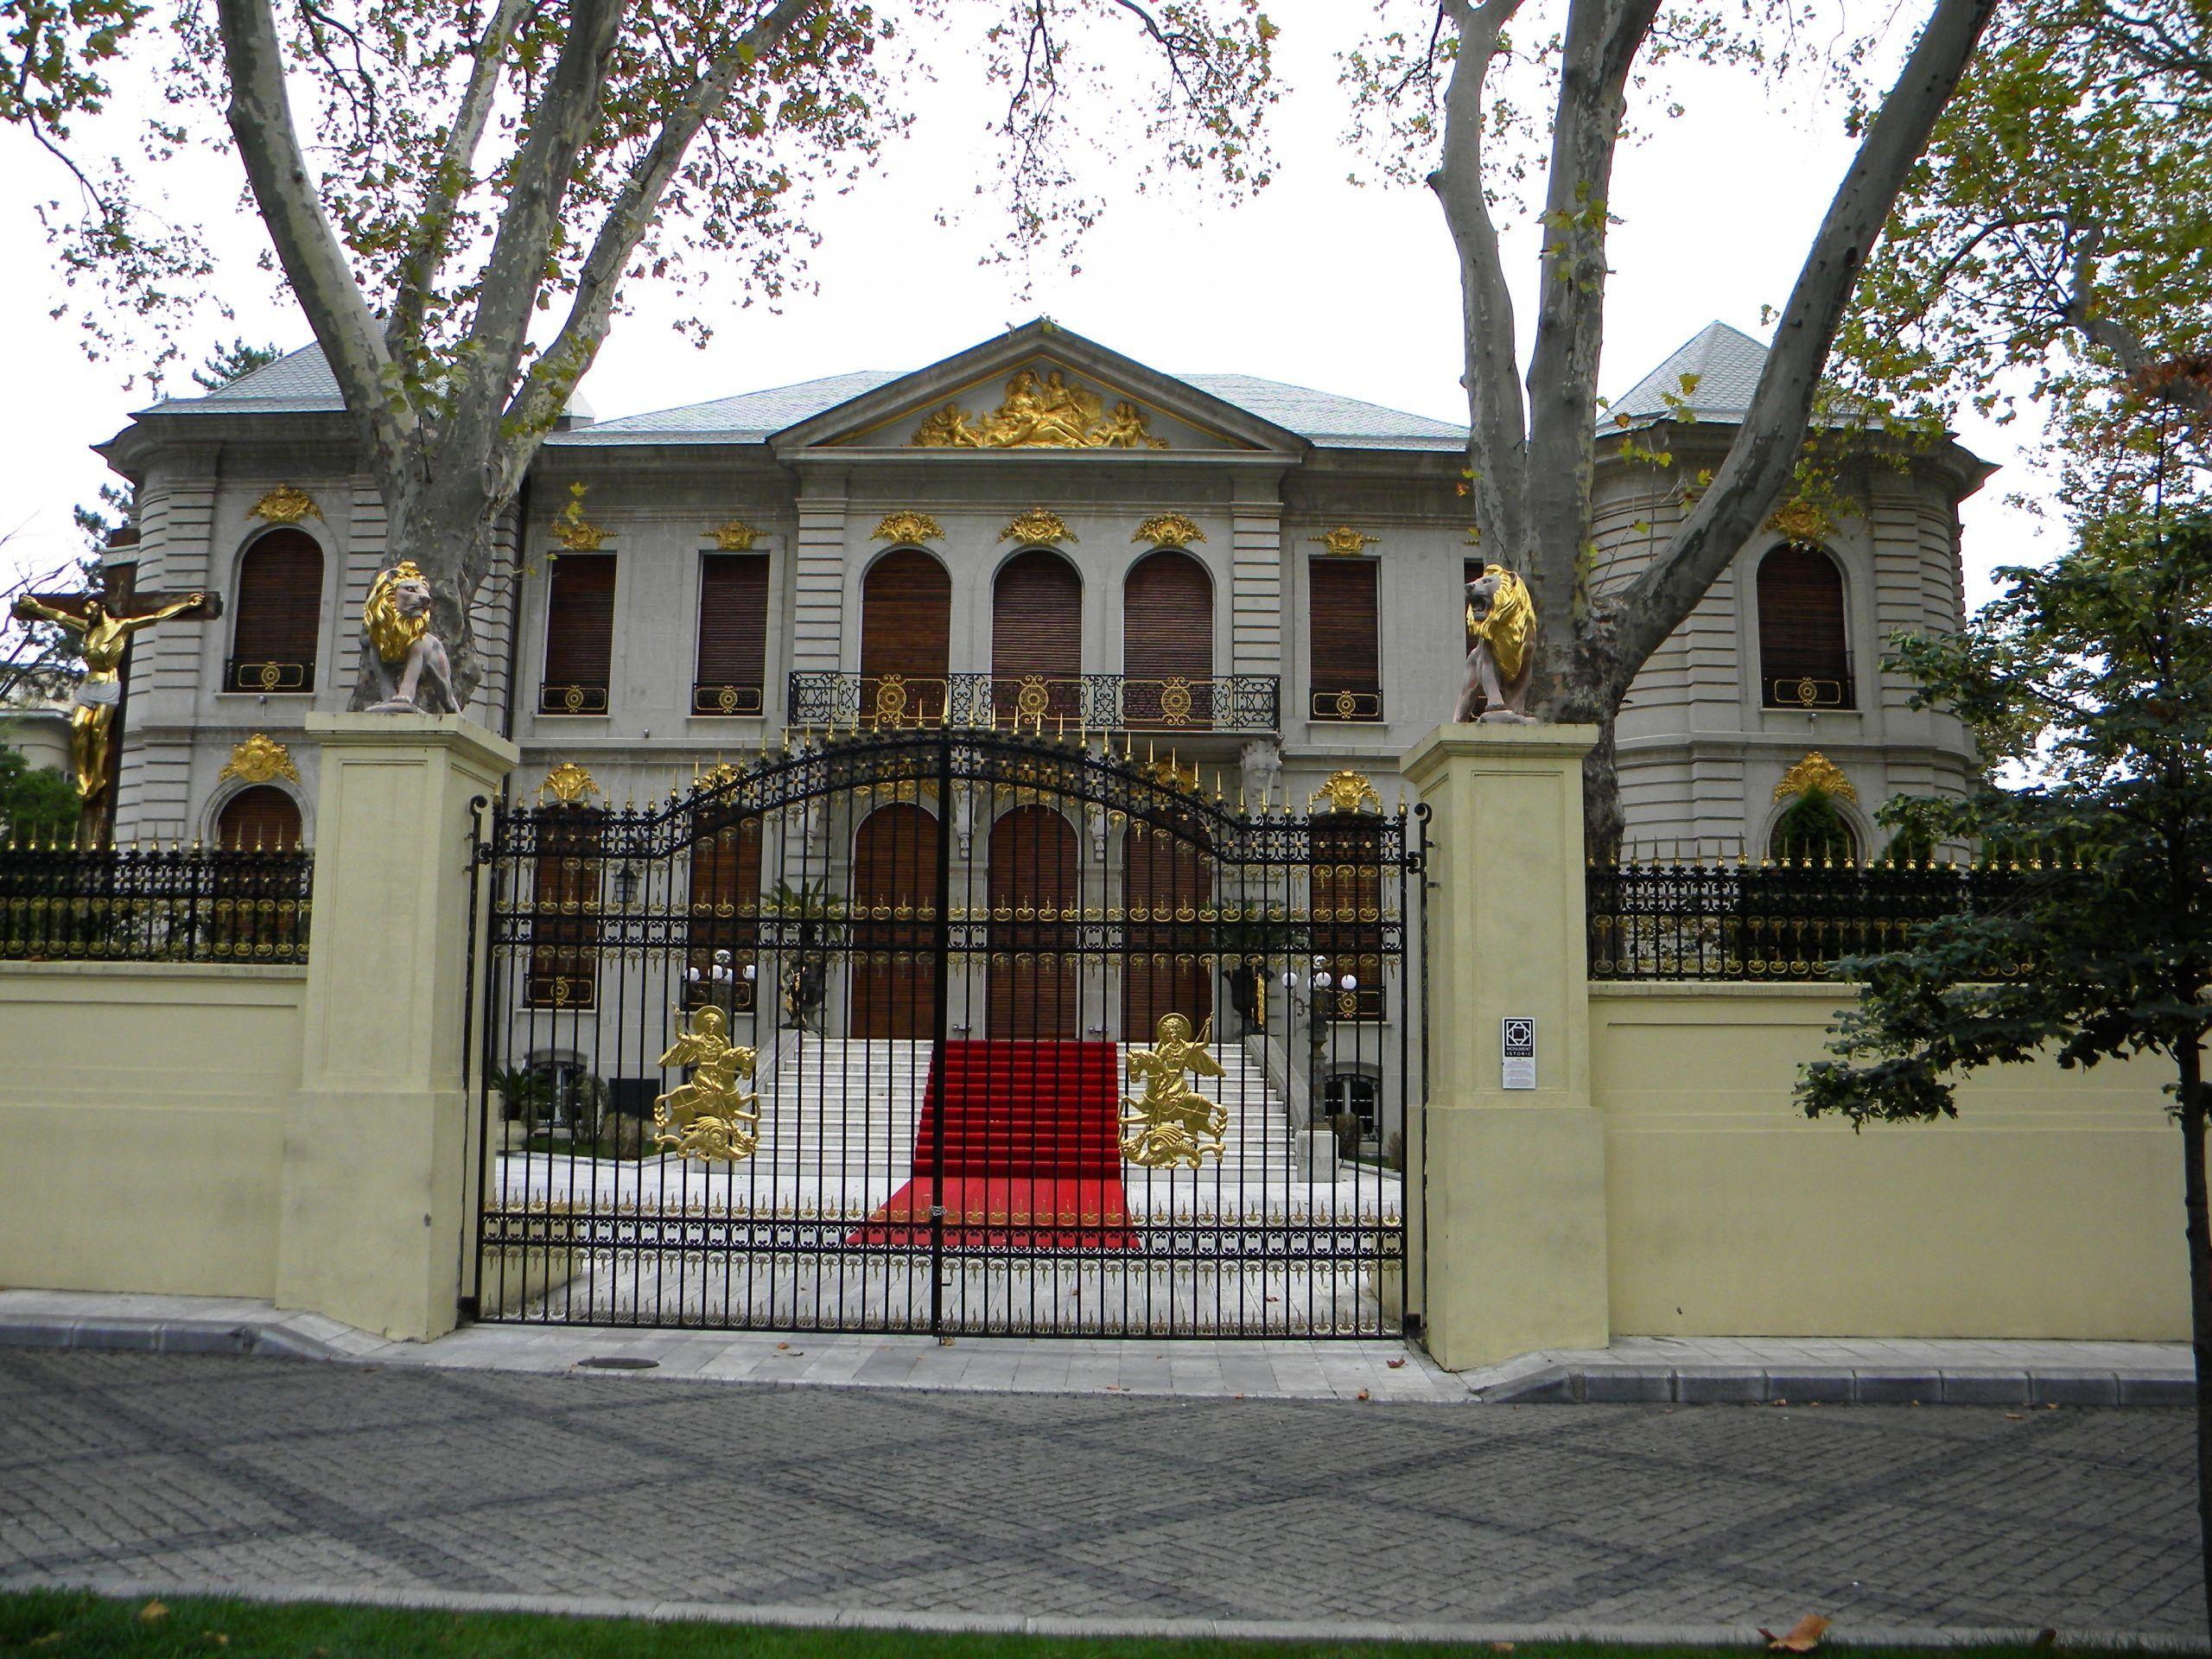 Aveți palat?  - Bucuresti Romania Aleea Modrogan nr - Aveți palat?